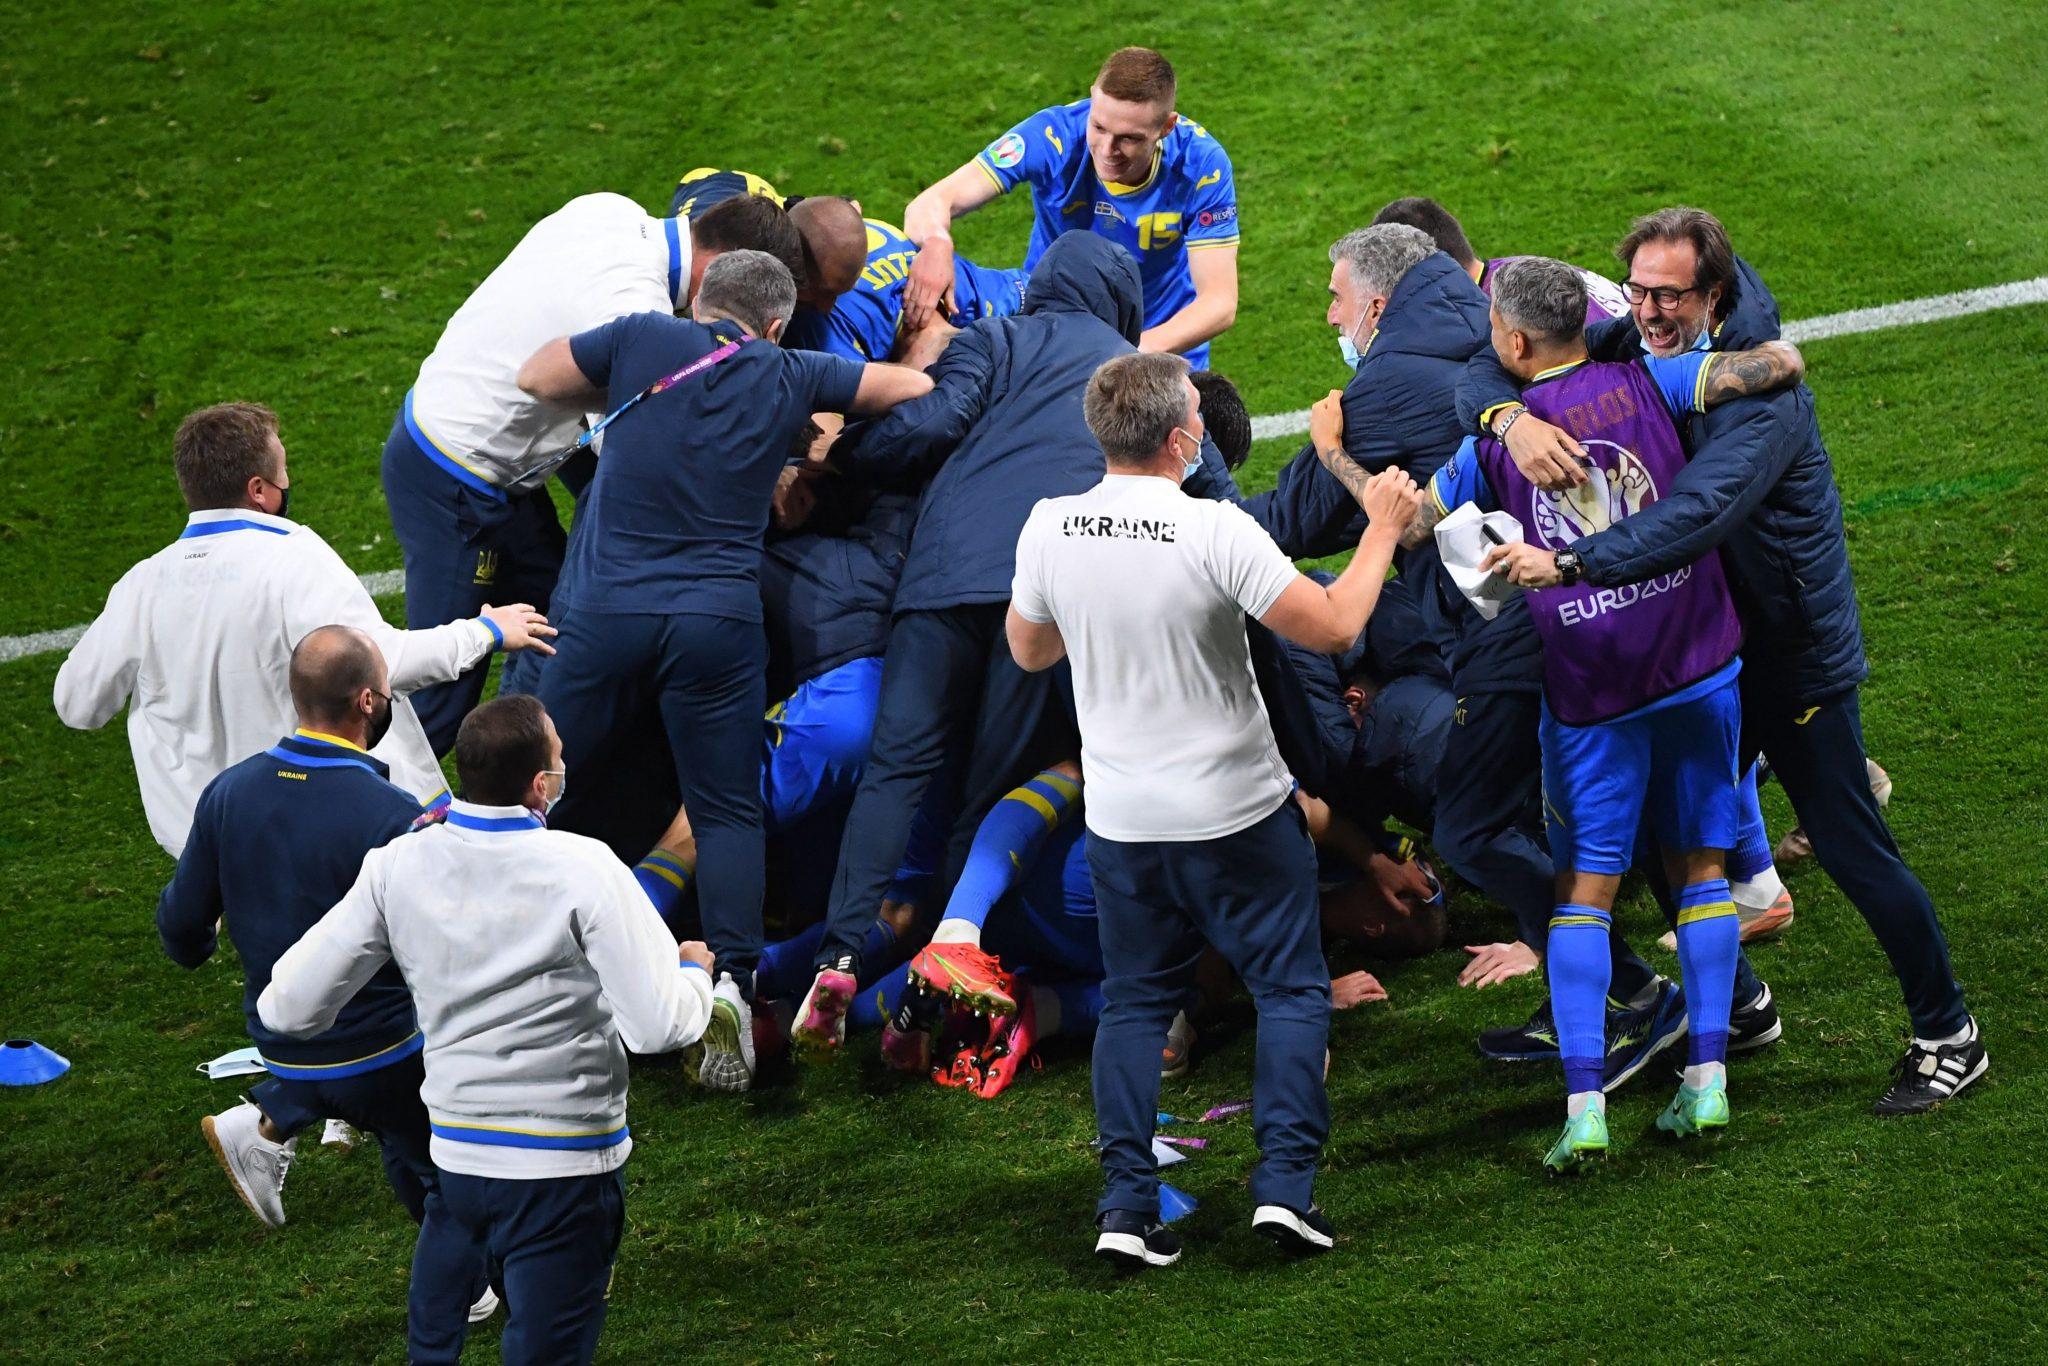 Euro 2020: অঘটনের ইউরোয় এবার কোপ সুইডেনের ওপর, ইউক্রেনের কাছে হেরে বিদায় সুইডিশরা